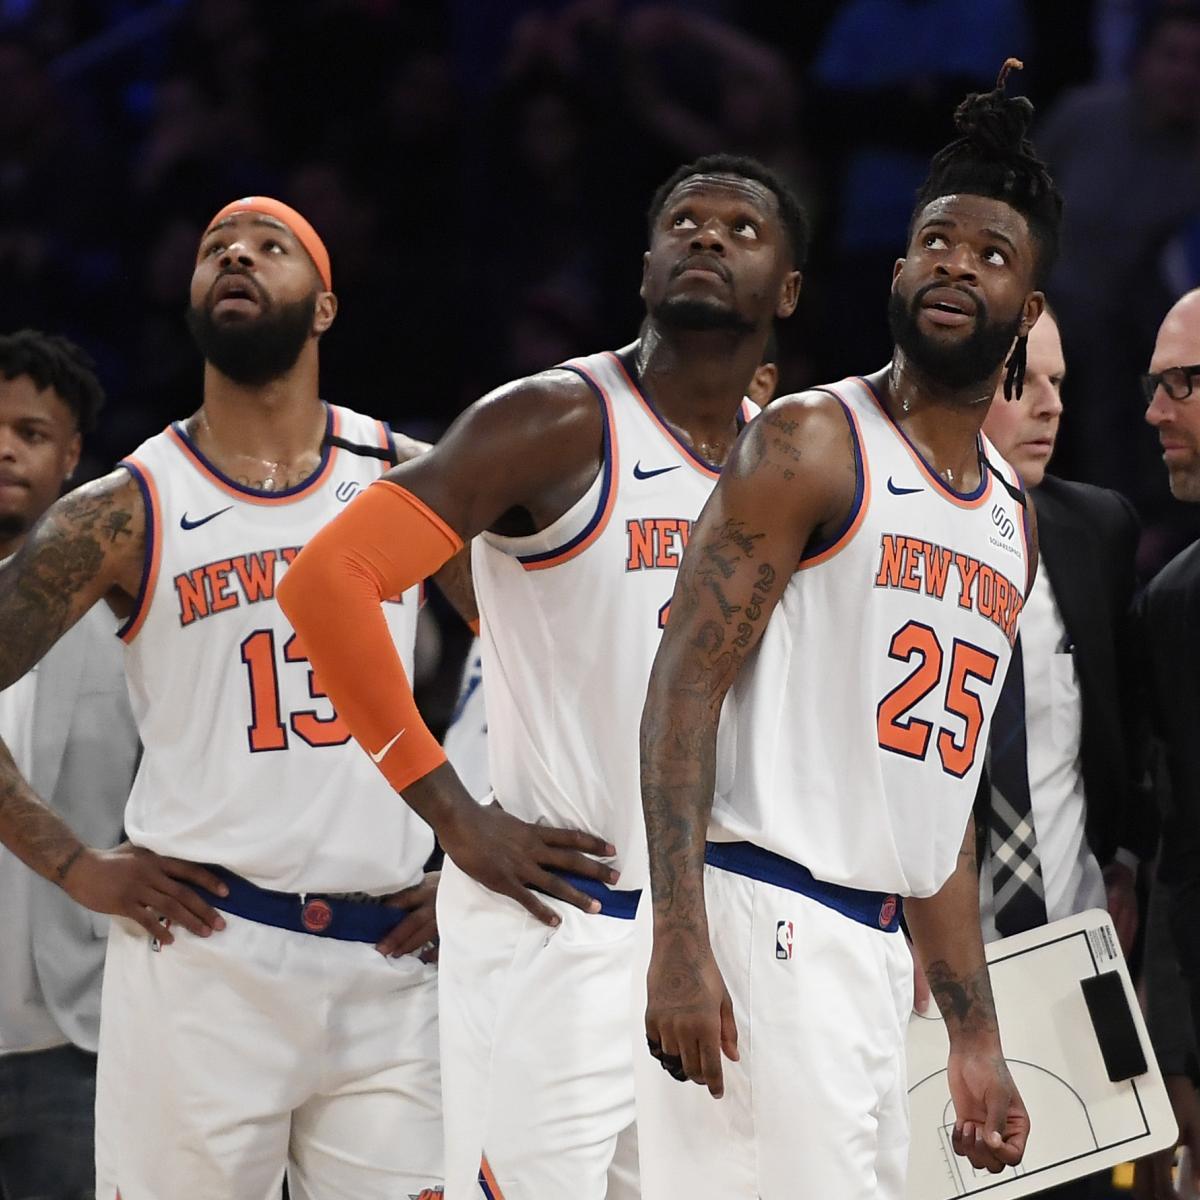 New York Knicks Suddenly NBA's Most Unpredictable Team at Trade Deadline